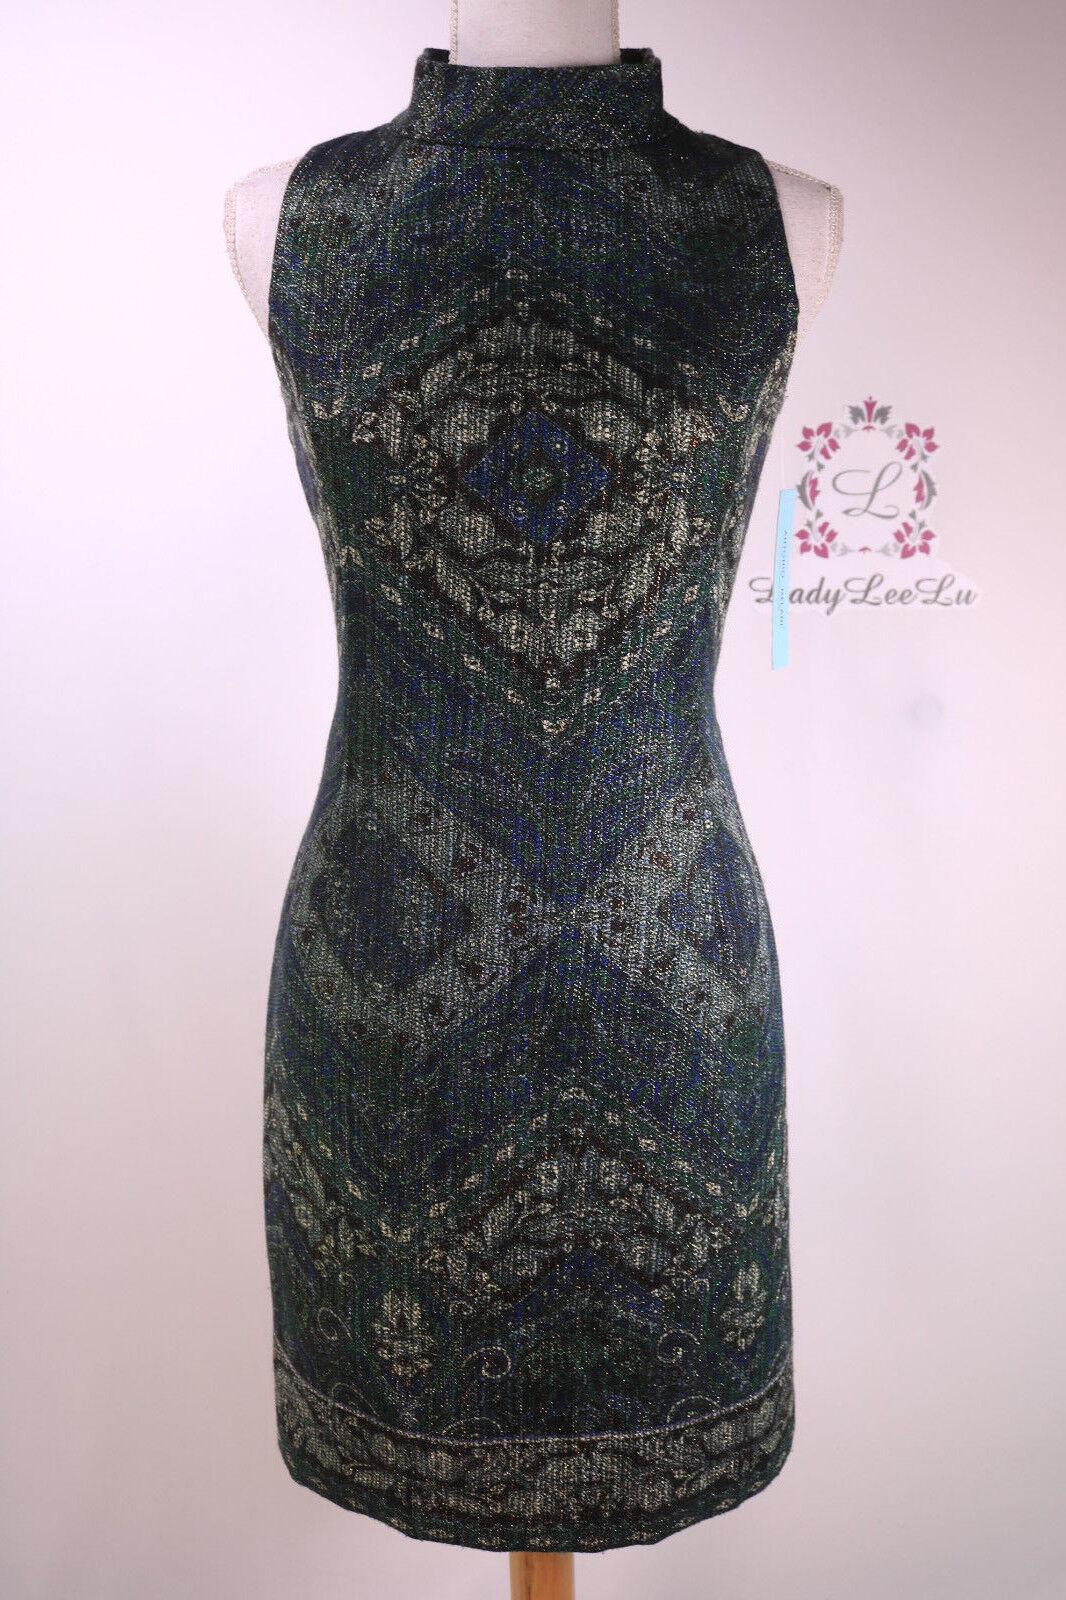 Antonio Melani New Juni Metallic Jacquard Dress Größe 2 6 8 10 12 New NWT